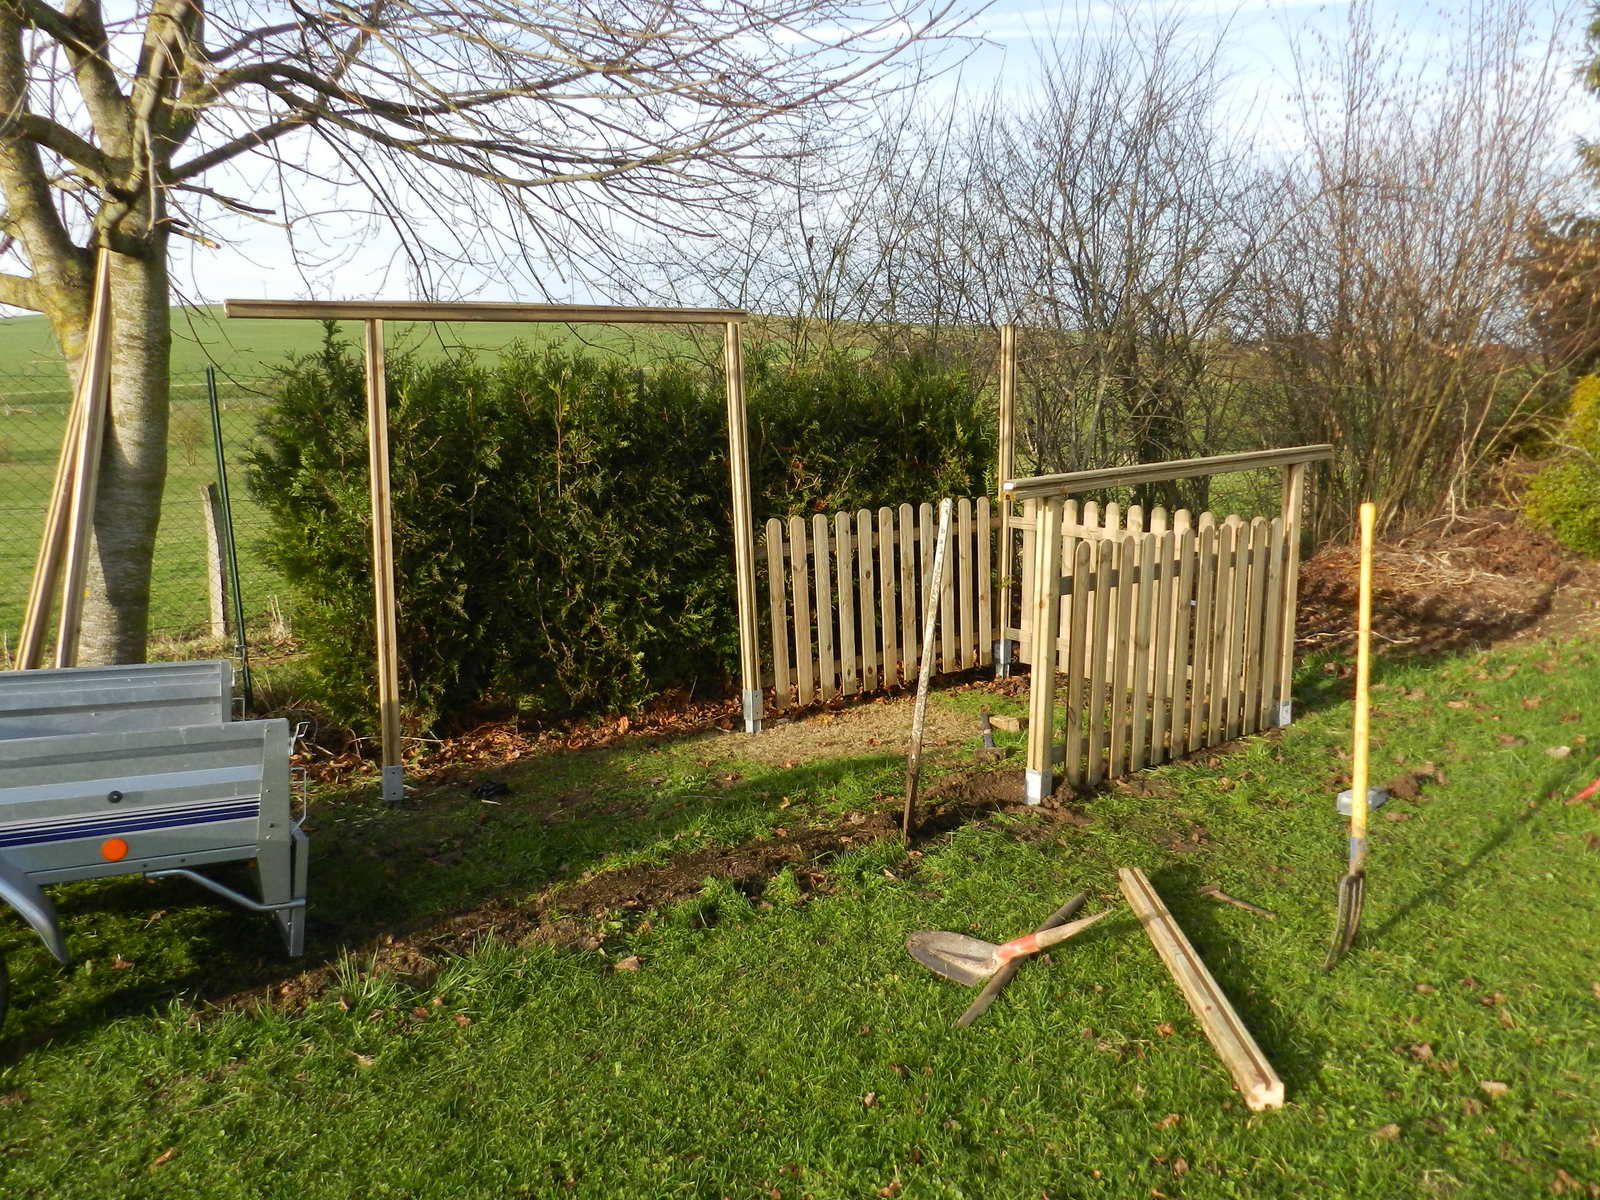 Permis de construire pour abri de jardin construire un for Construire abri jardin